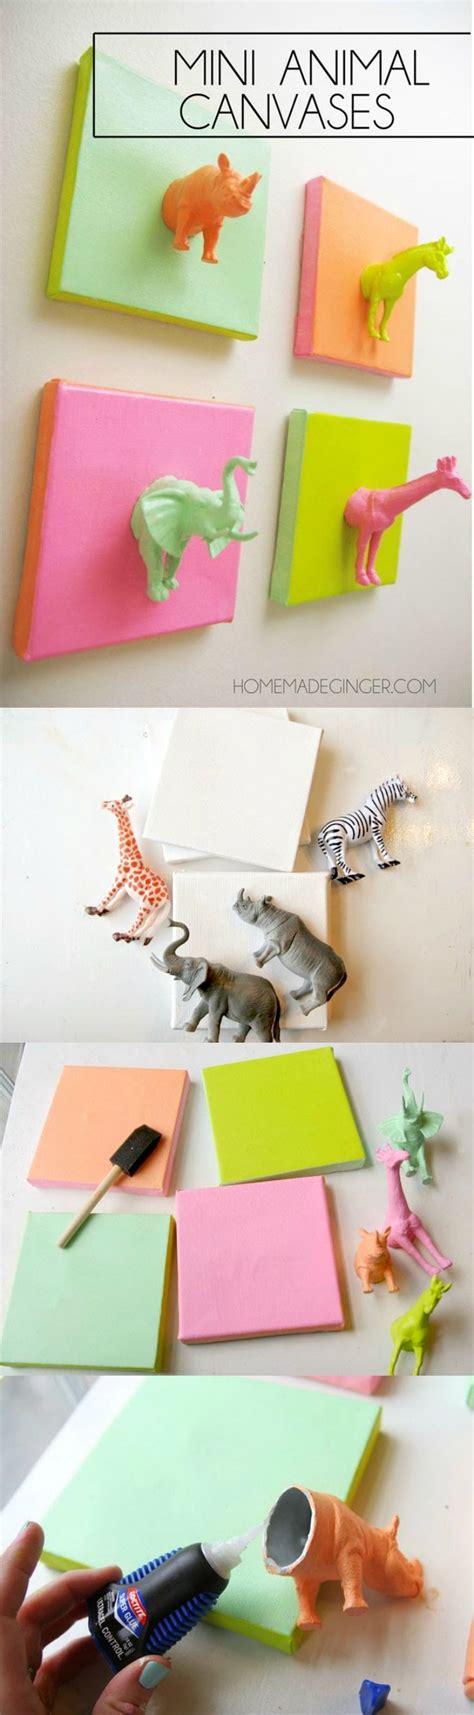 diy decor fails craft mini plastic animals diy canvas craft studios diy